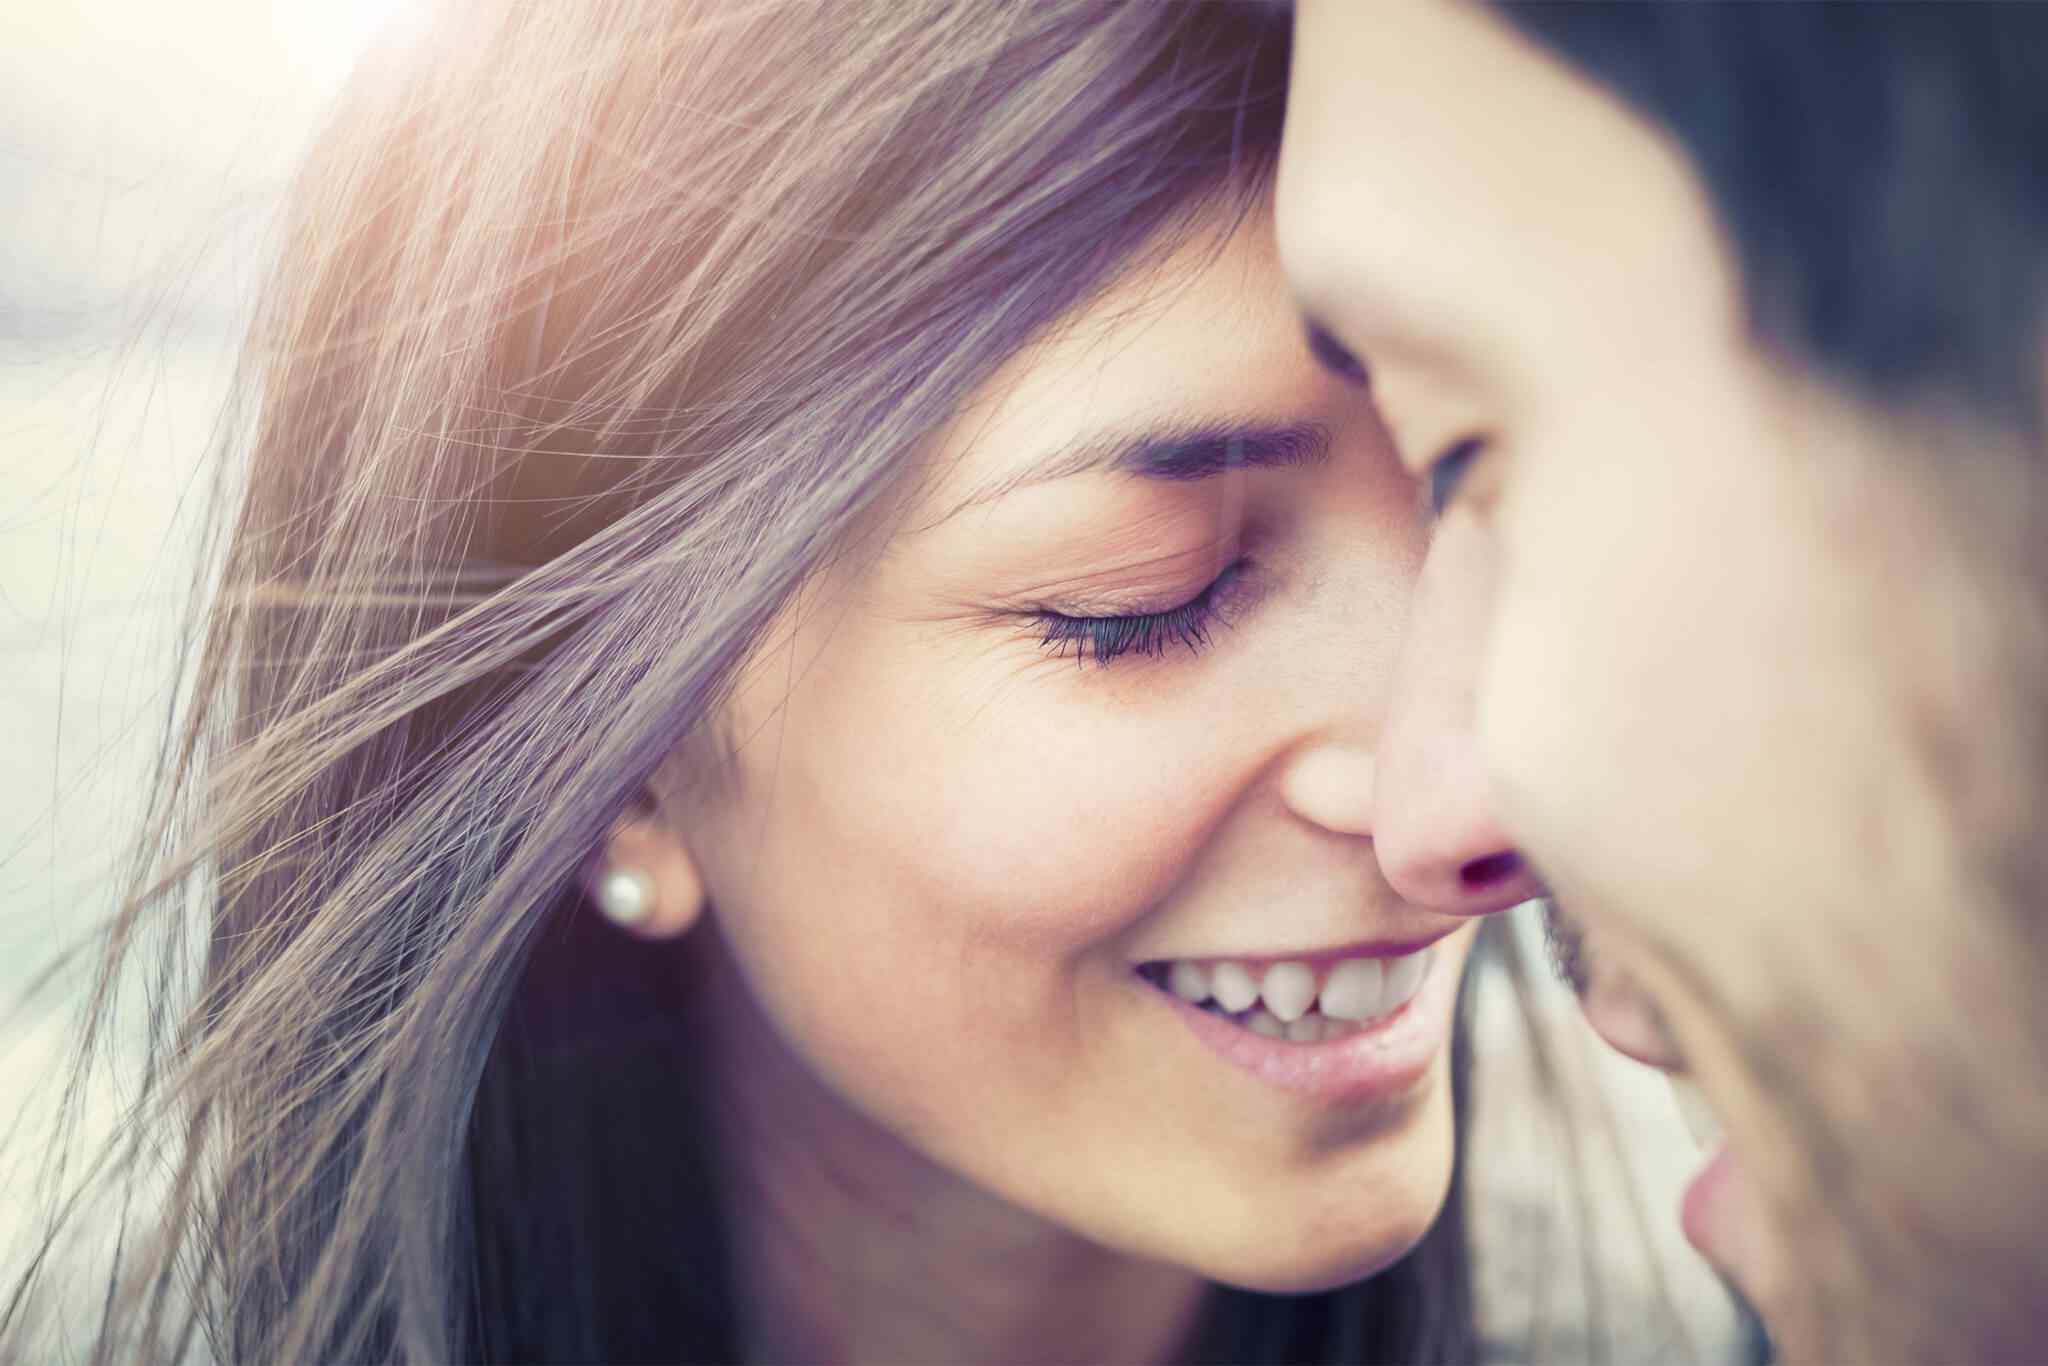 https://www.porkcolombia.co/wp-content/uploads/2018/01/img-class-marriage-01.jpg